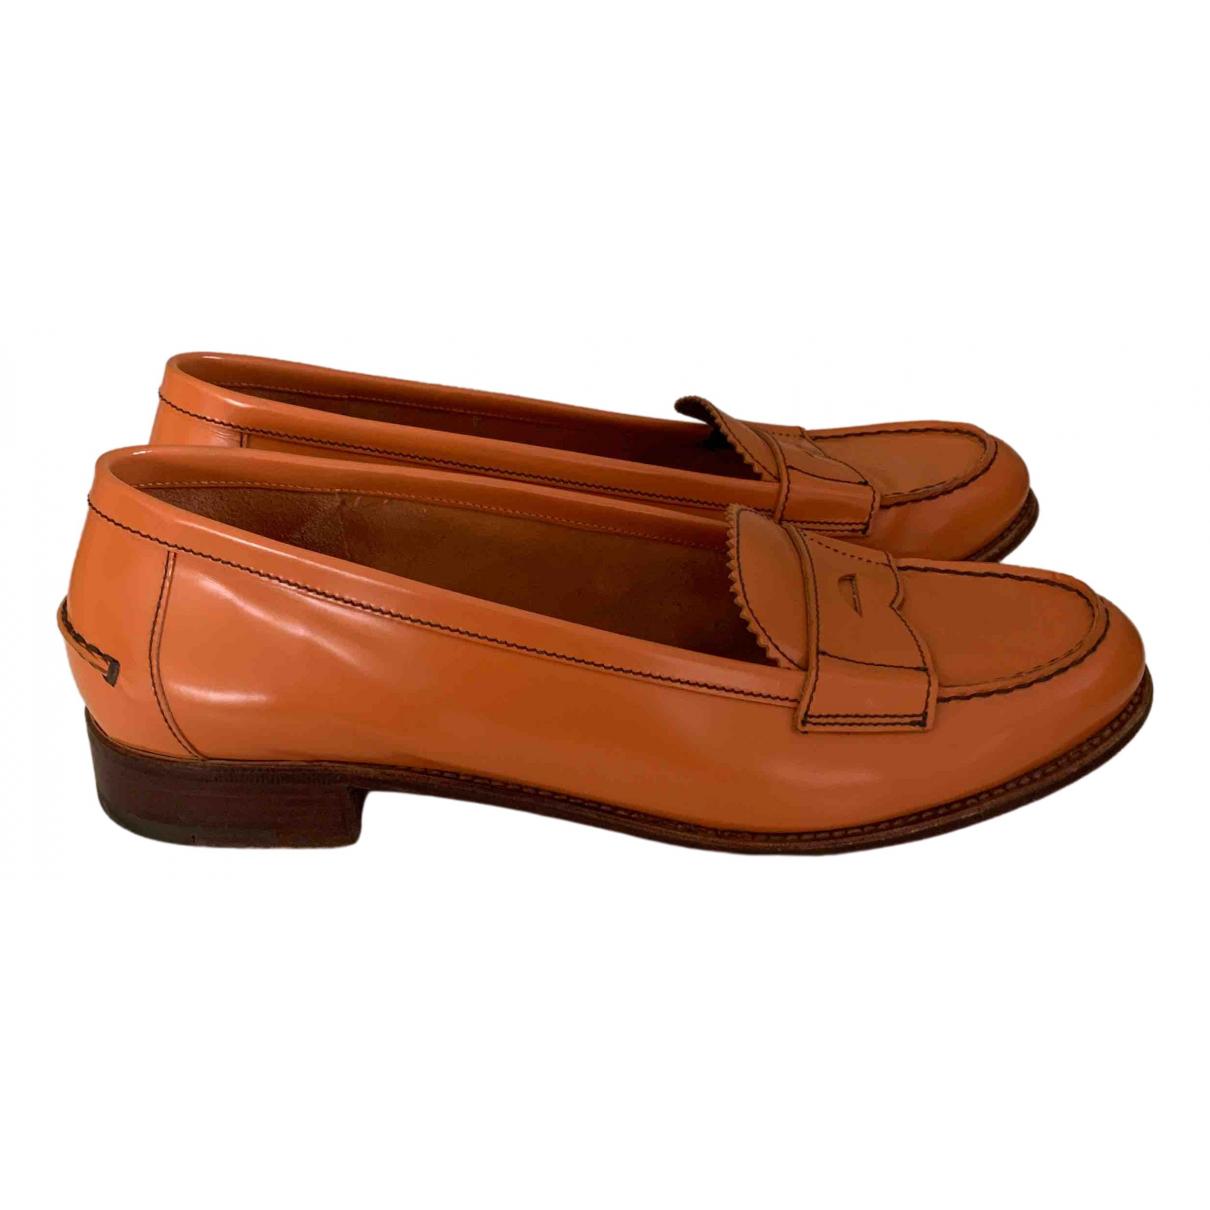 Prada \N Orange Leather Flats for Women 41 IT